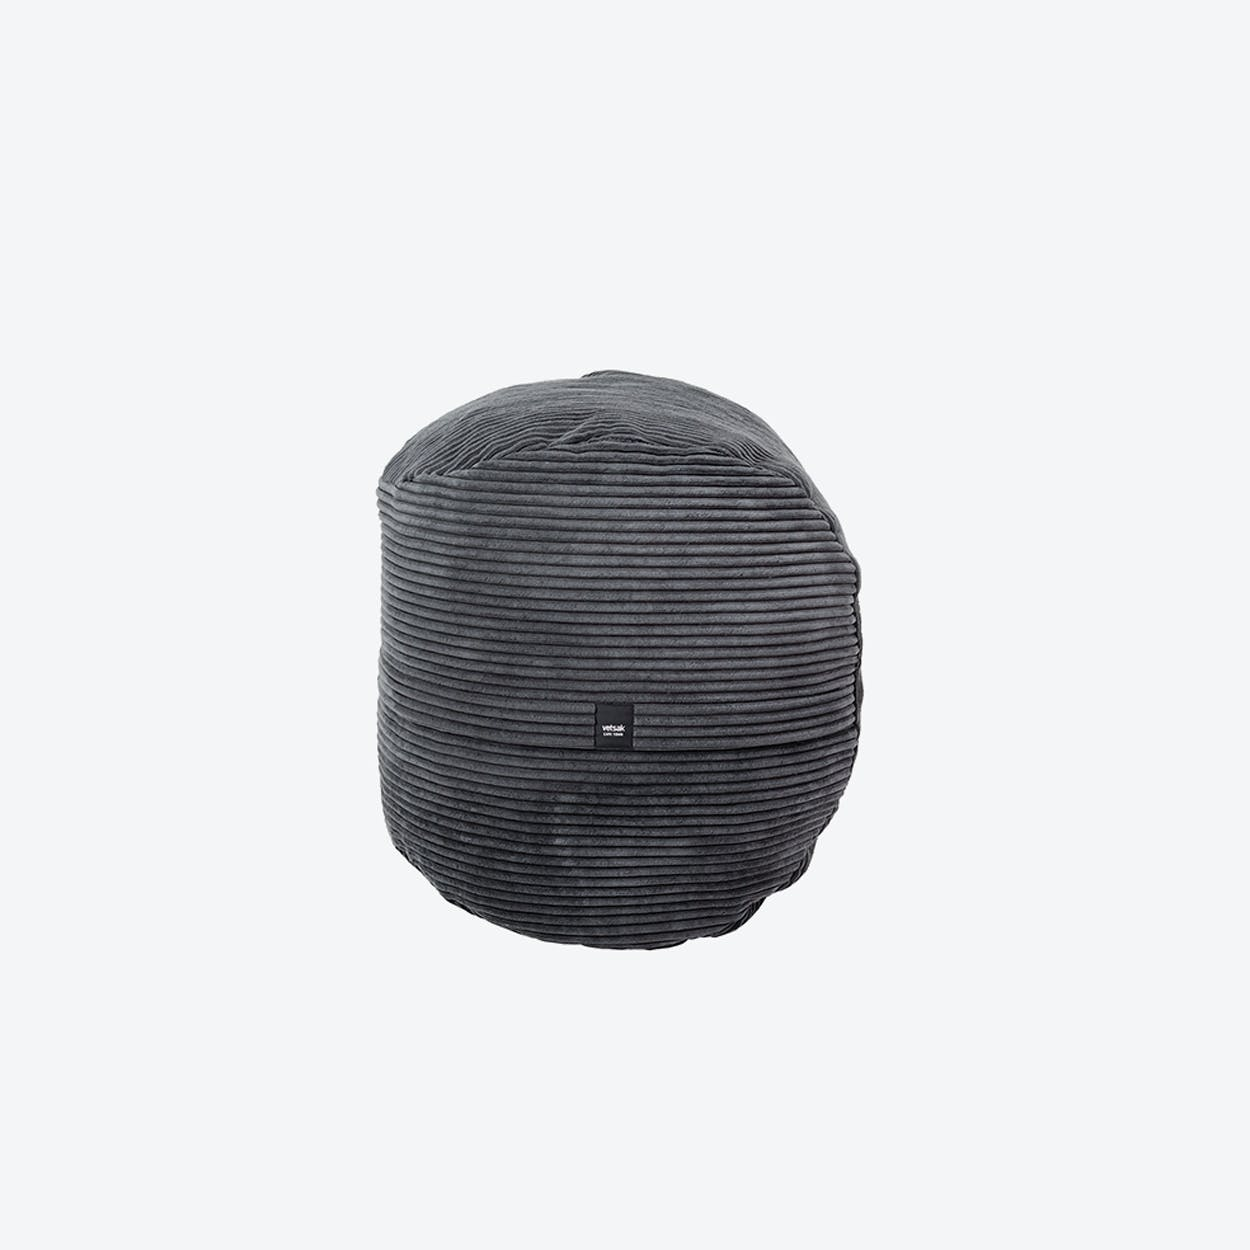 Footsask in Dark Grey Corduroy